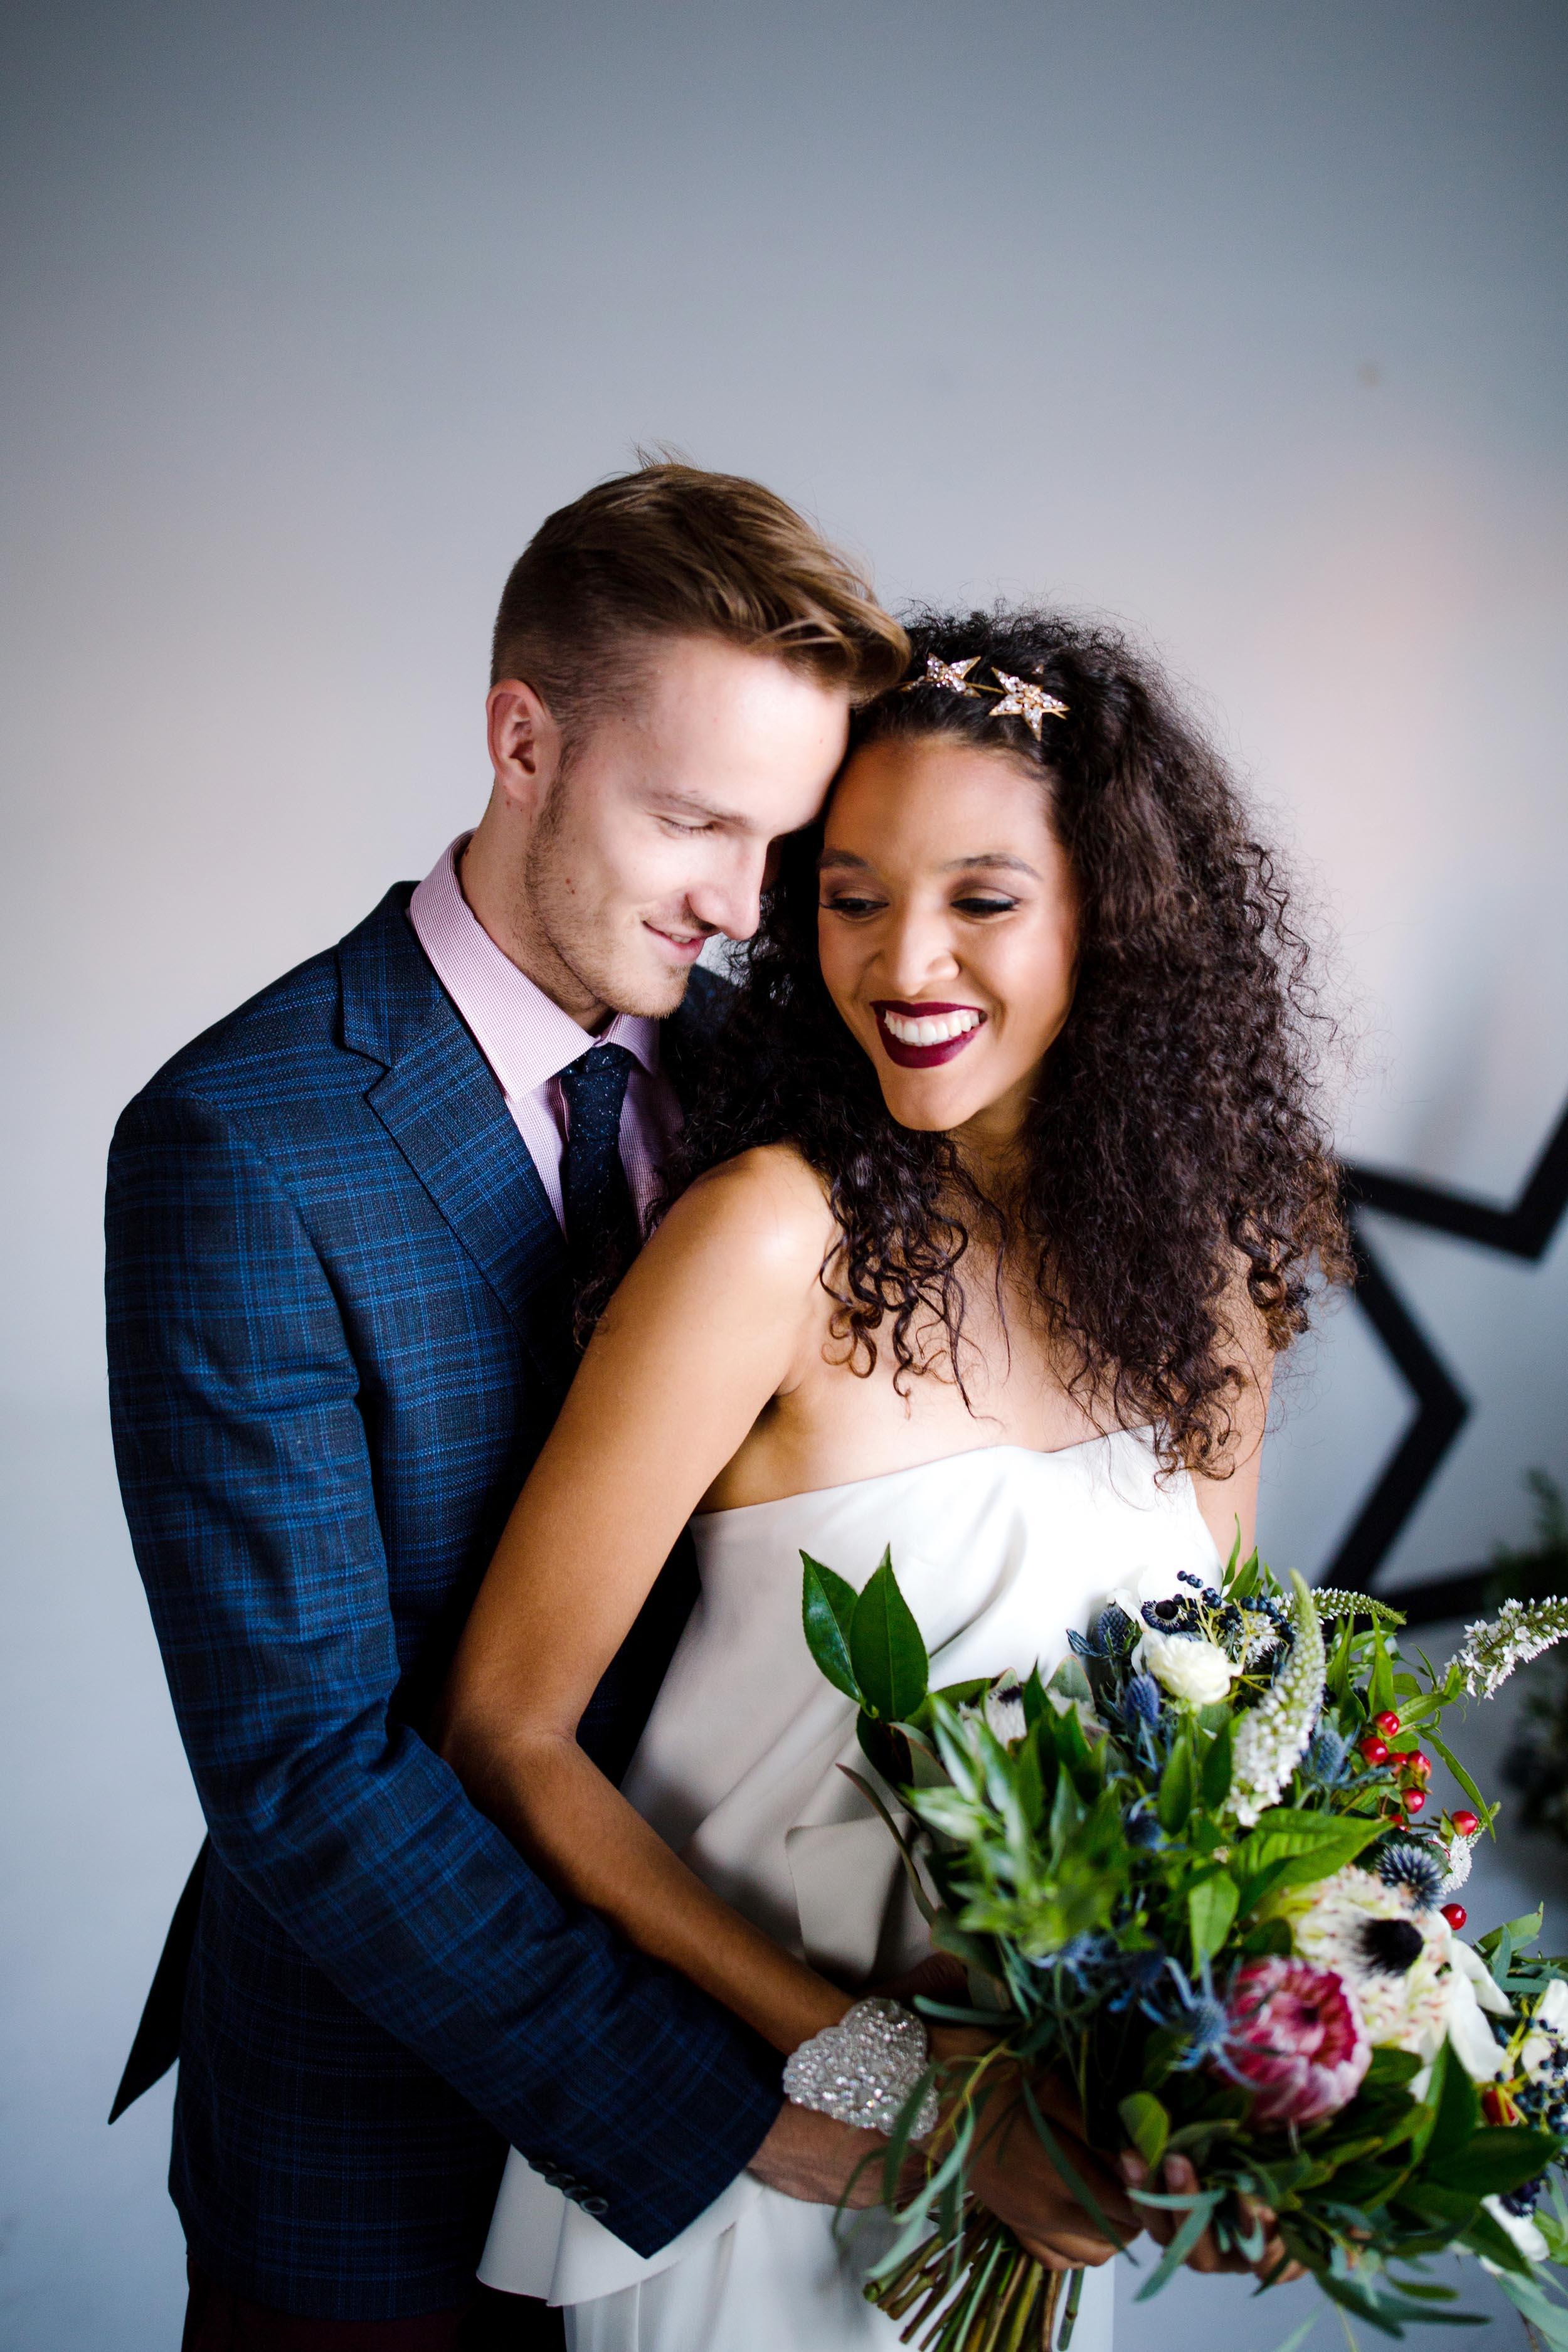 weddings-starsstripes-35.jpg